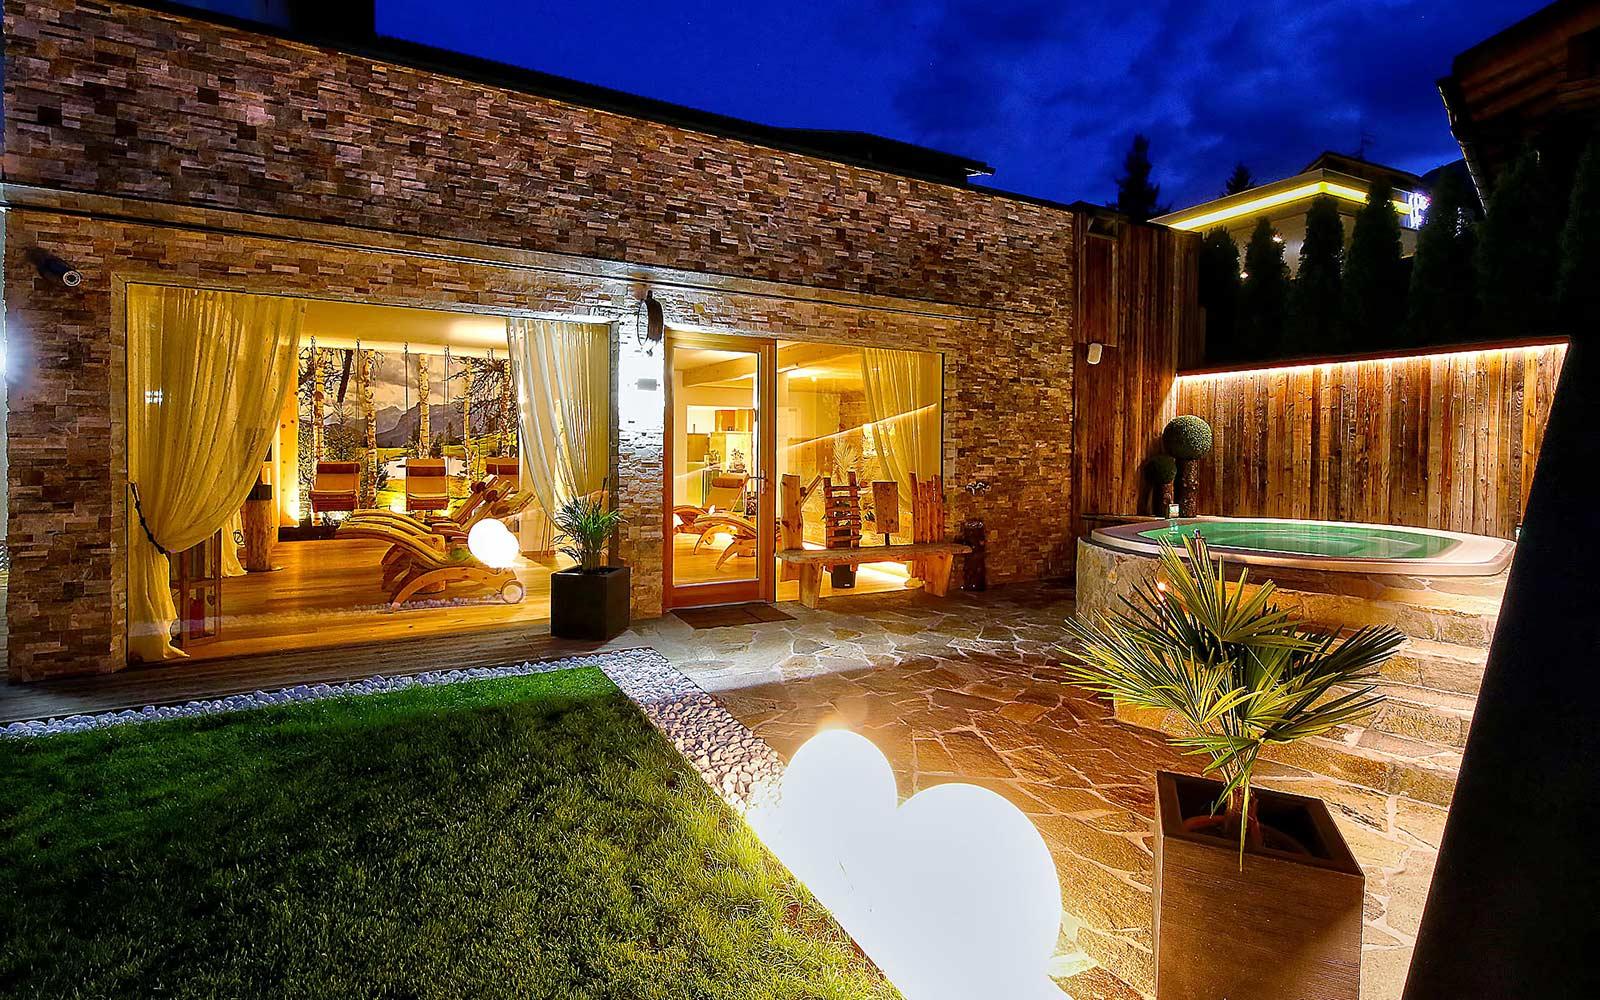 VASCA IDROMASSAGGIO<br>HOTEL LA BERCIA - LA VILLA